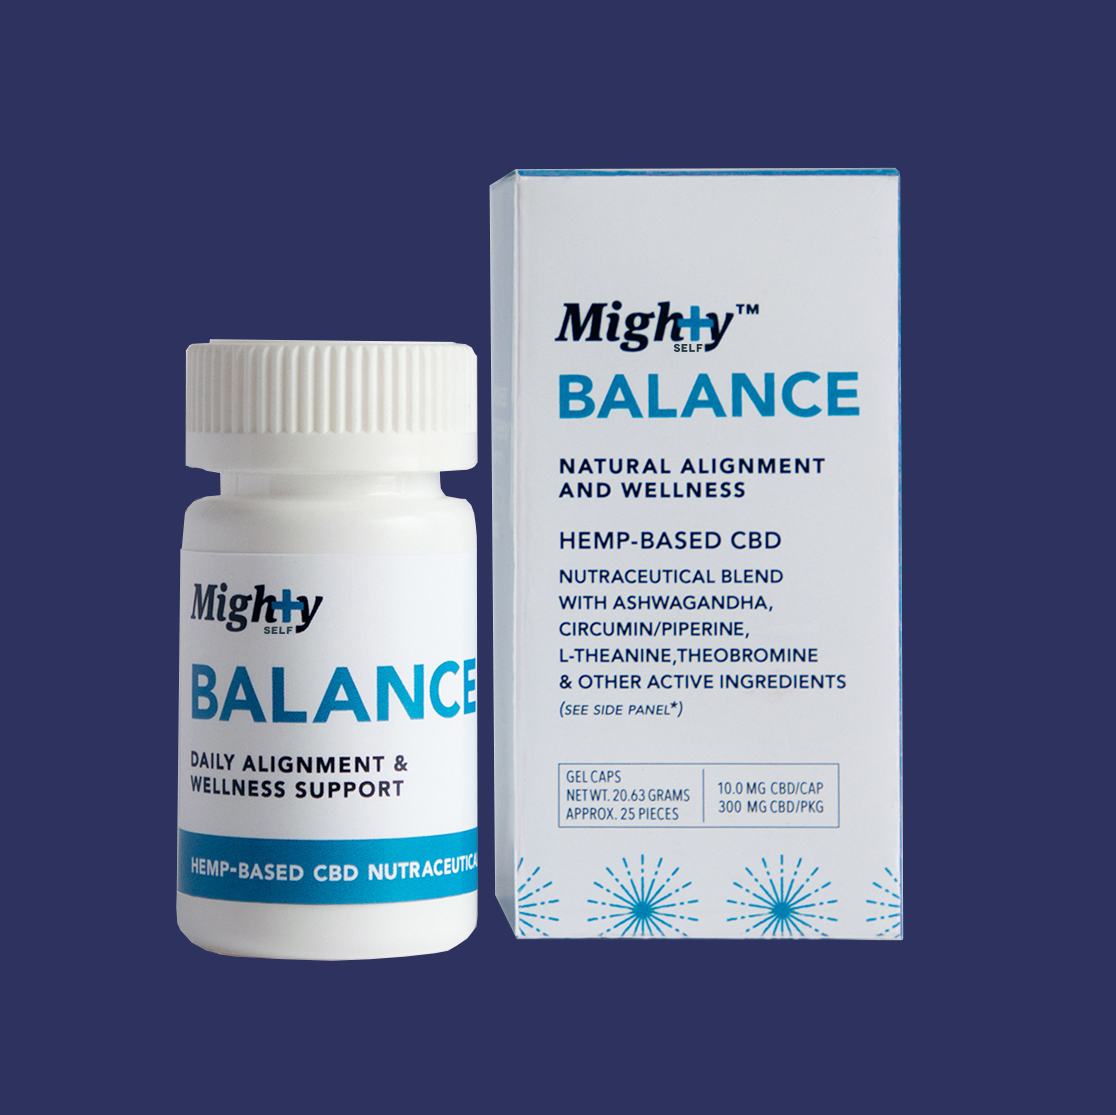 Mighty-Balance-CBD.png